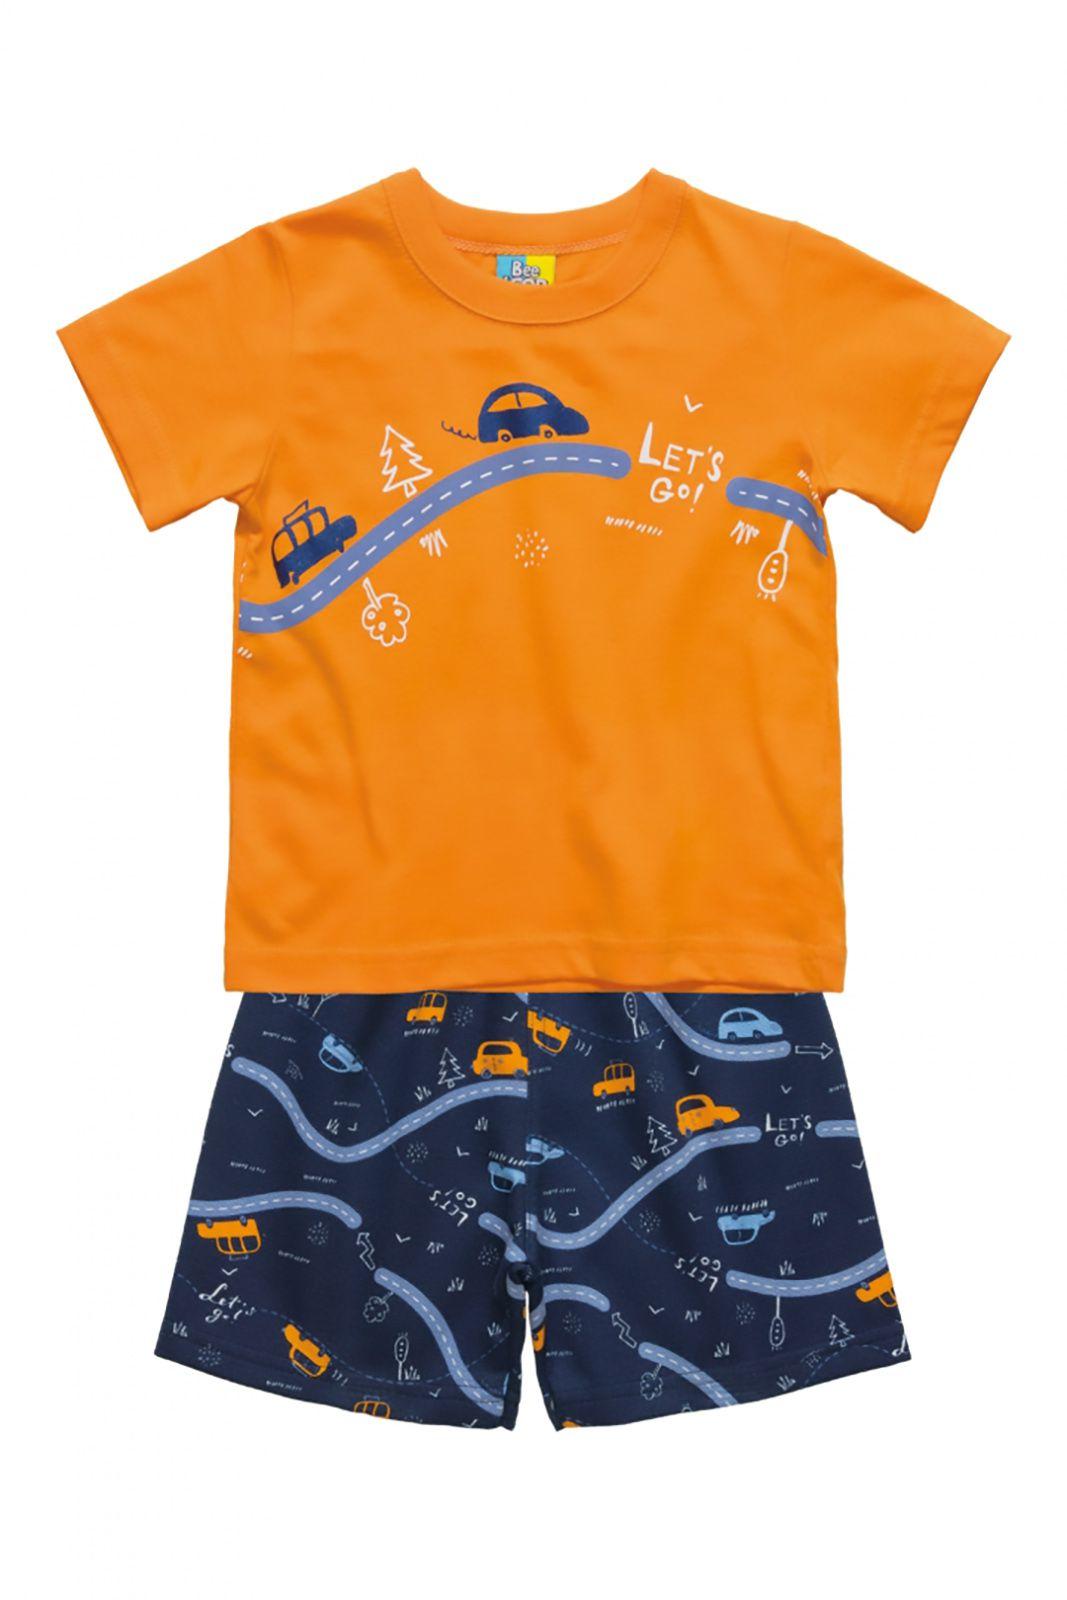 Conjunto Camiseta em meia malha e Bermuda Moletinho Bee Loop Carrinho Laranja/Marinho - Tamanho 1